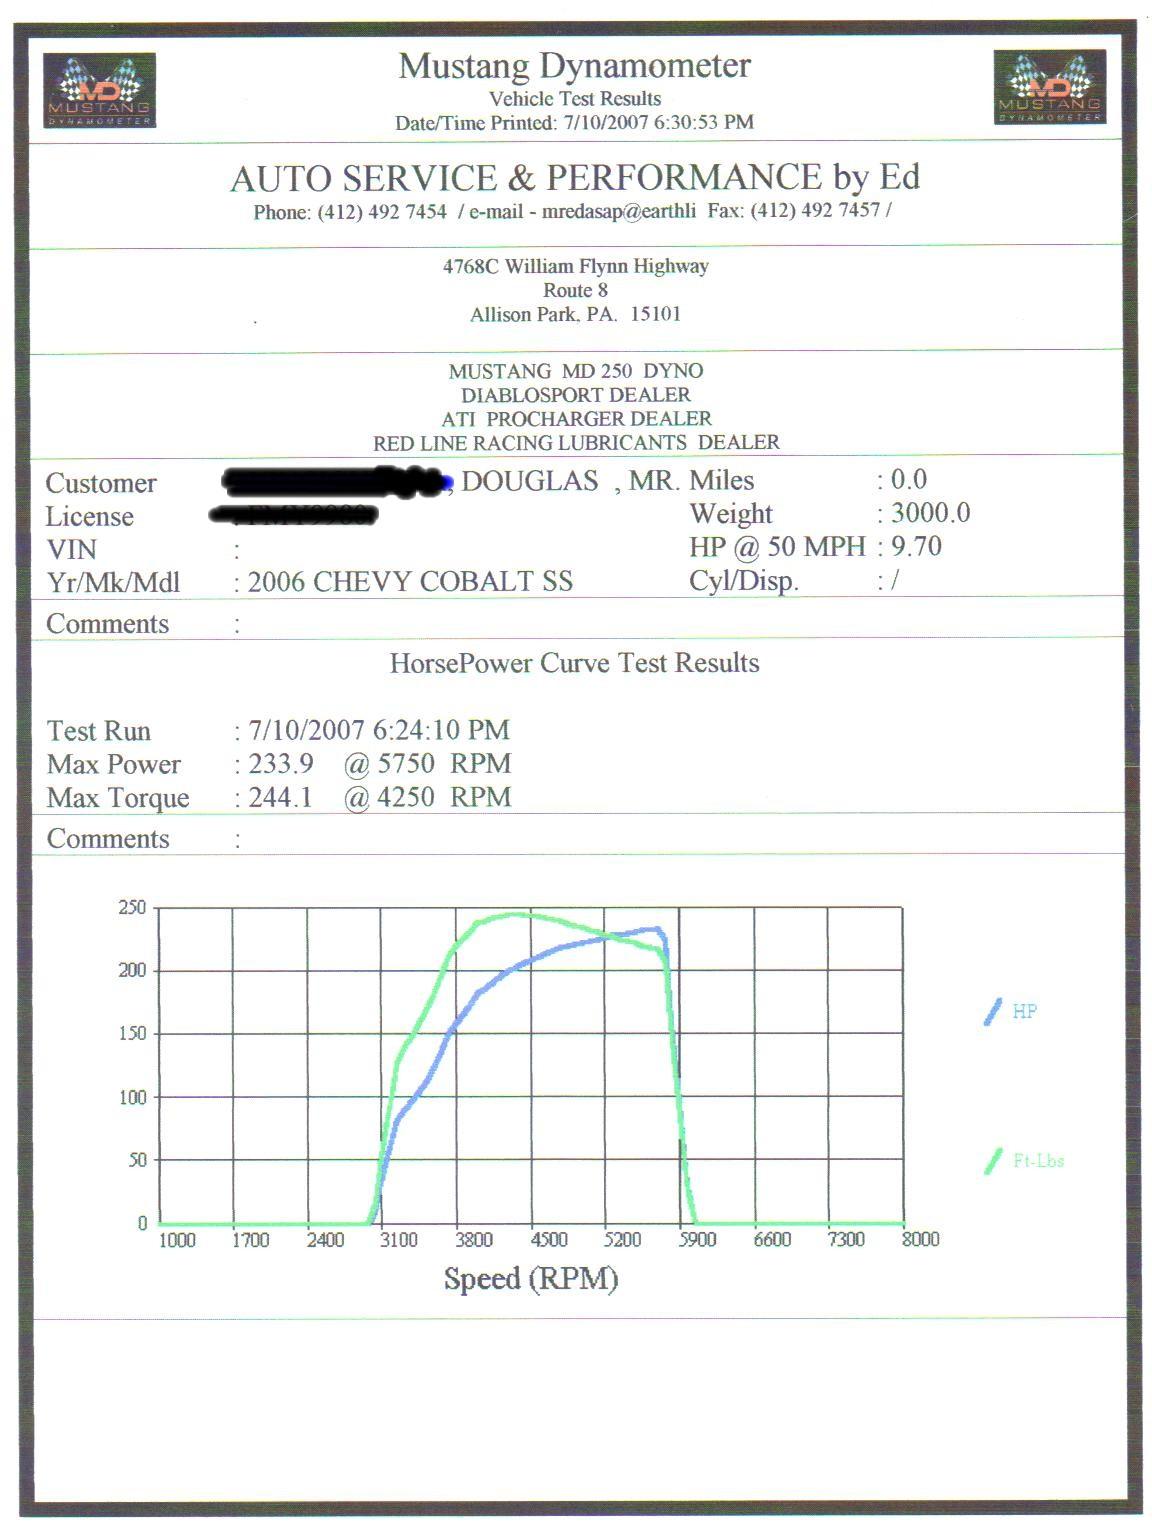 Chevrolet Cobalt Dyno Graph Results